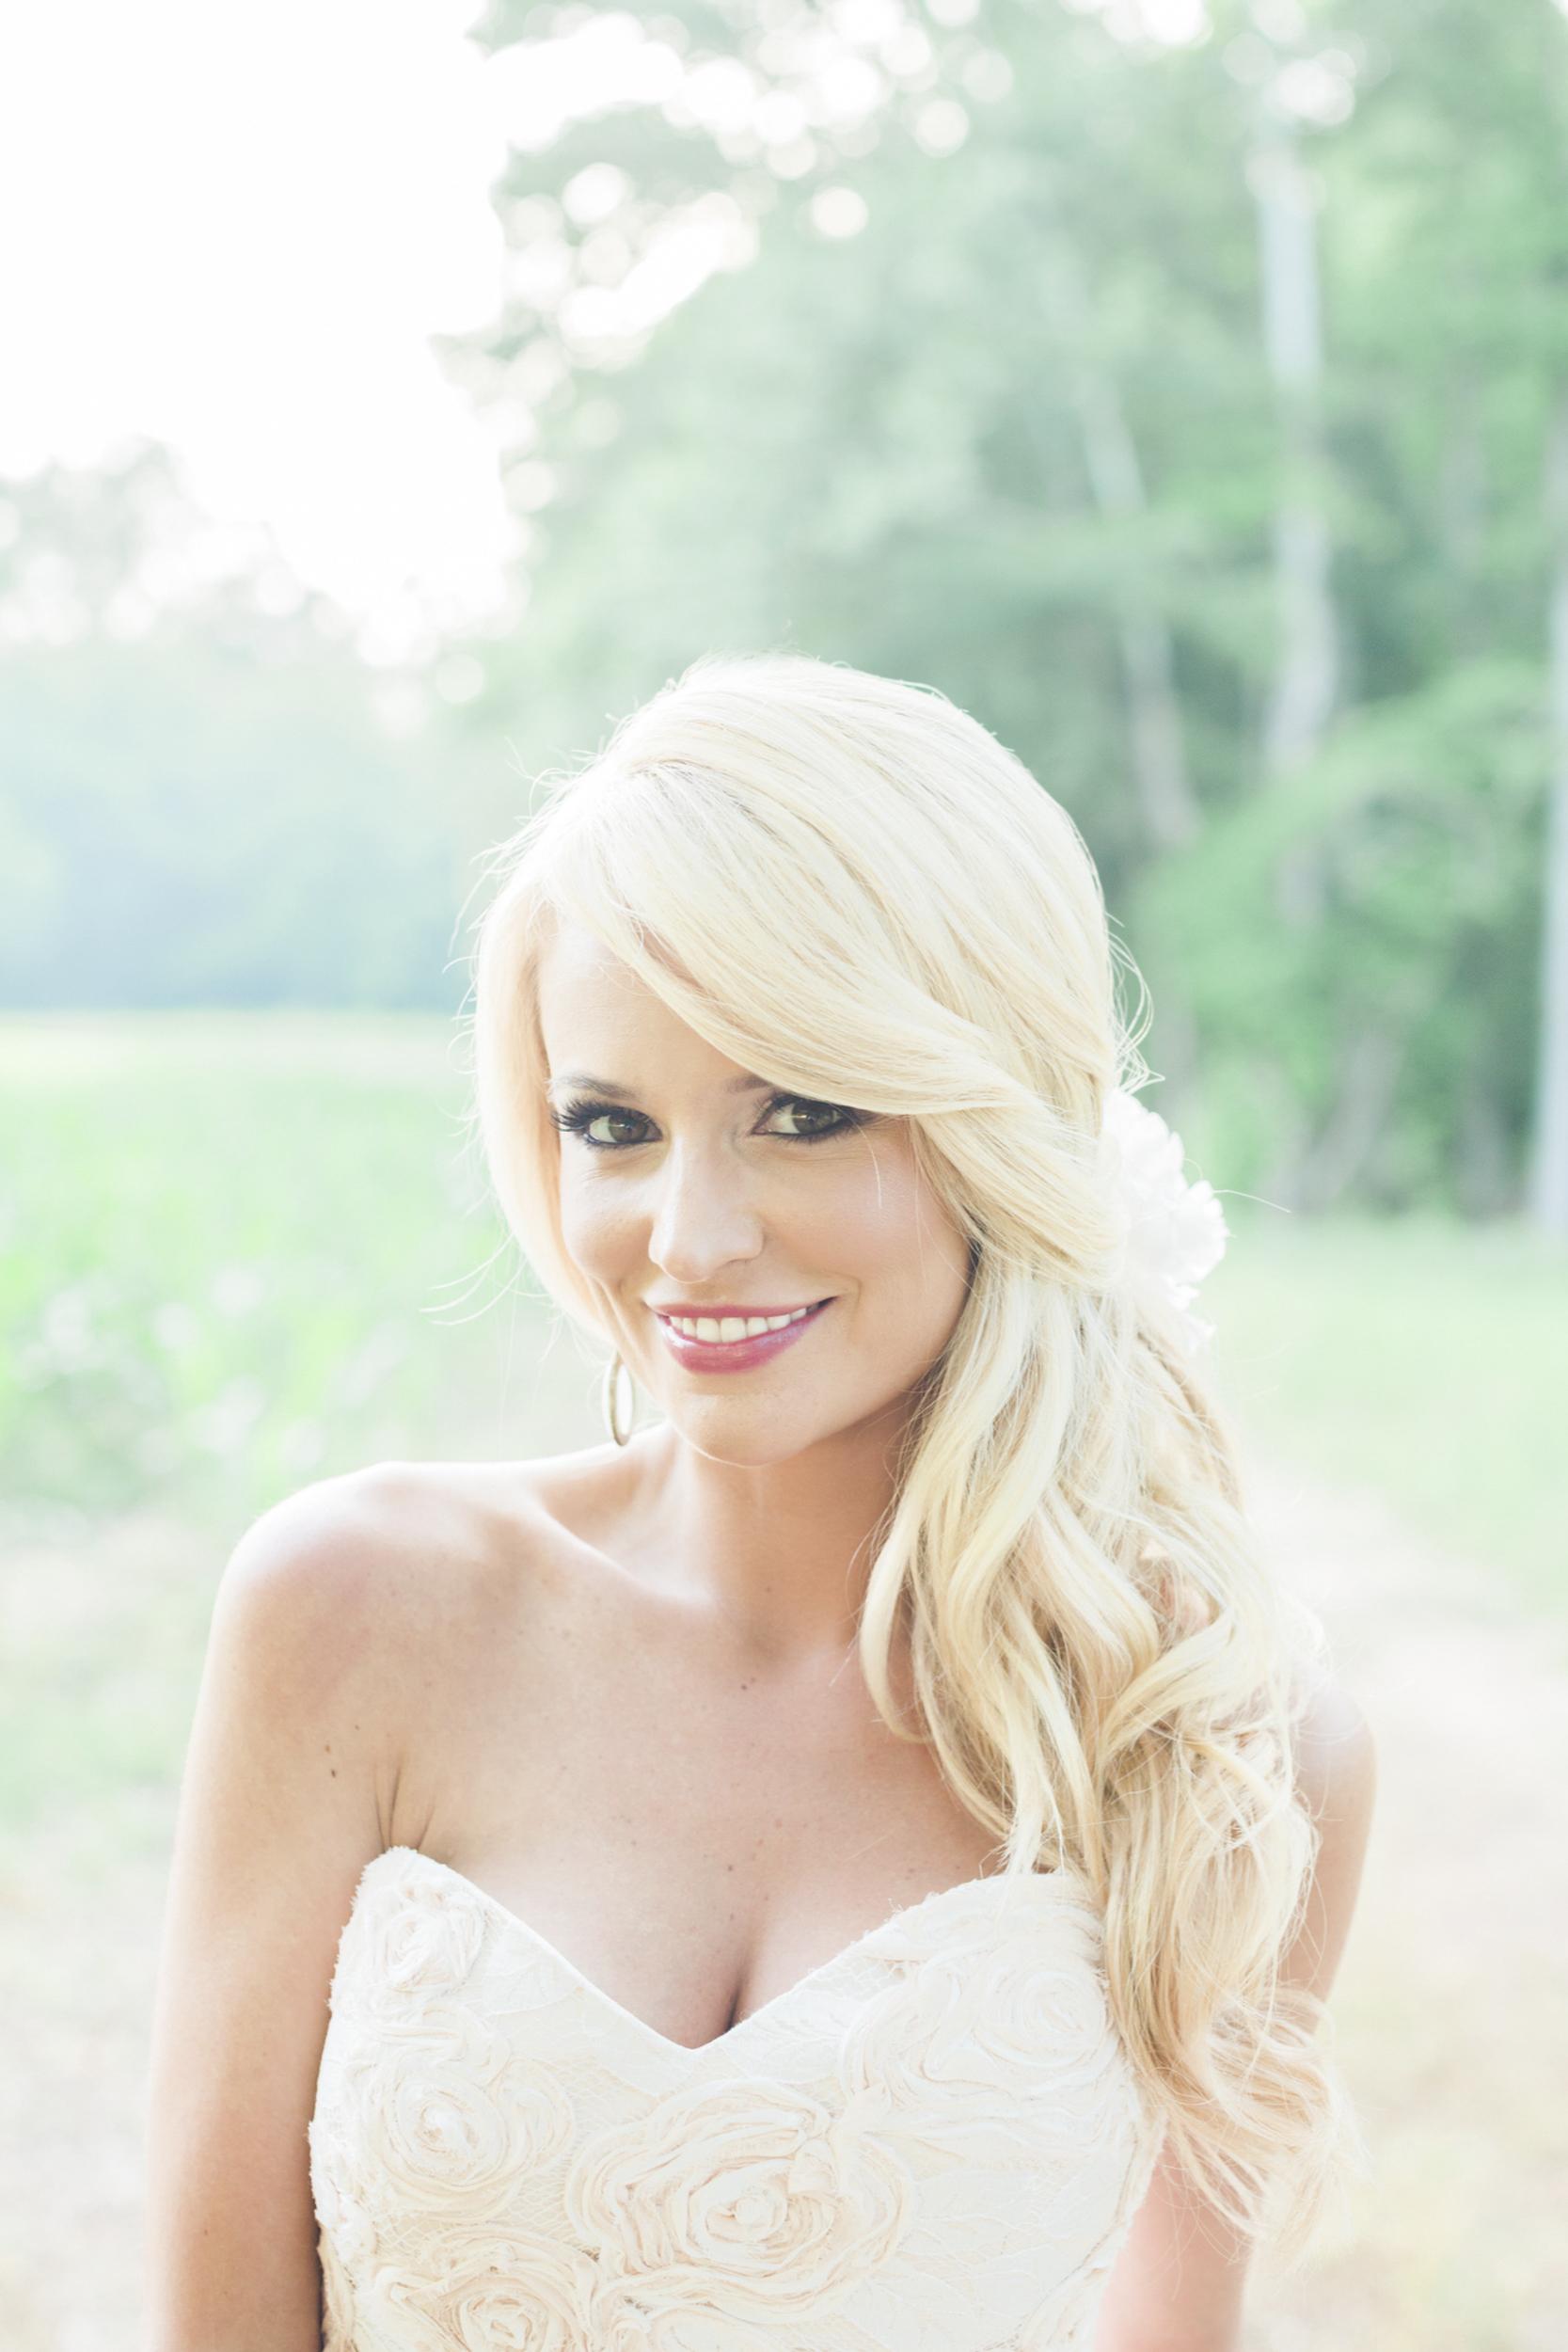 south_carolina_farm_wedding_rustic_chic_surprise_secret_luxe_wedding_bachelorette_emily_maynard_real_weddings-37.jpg